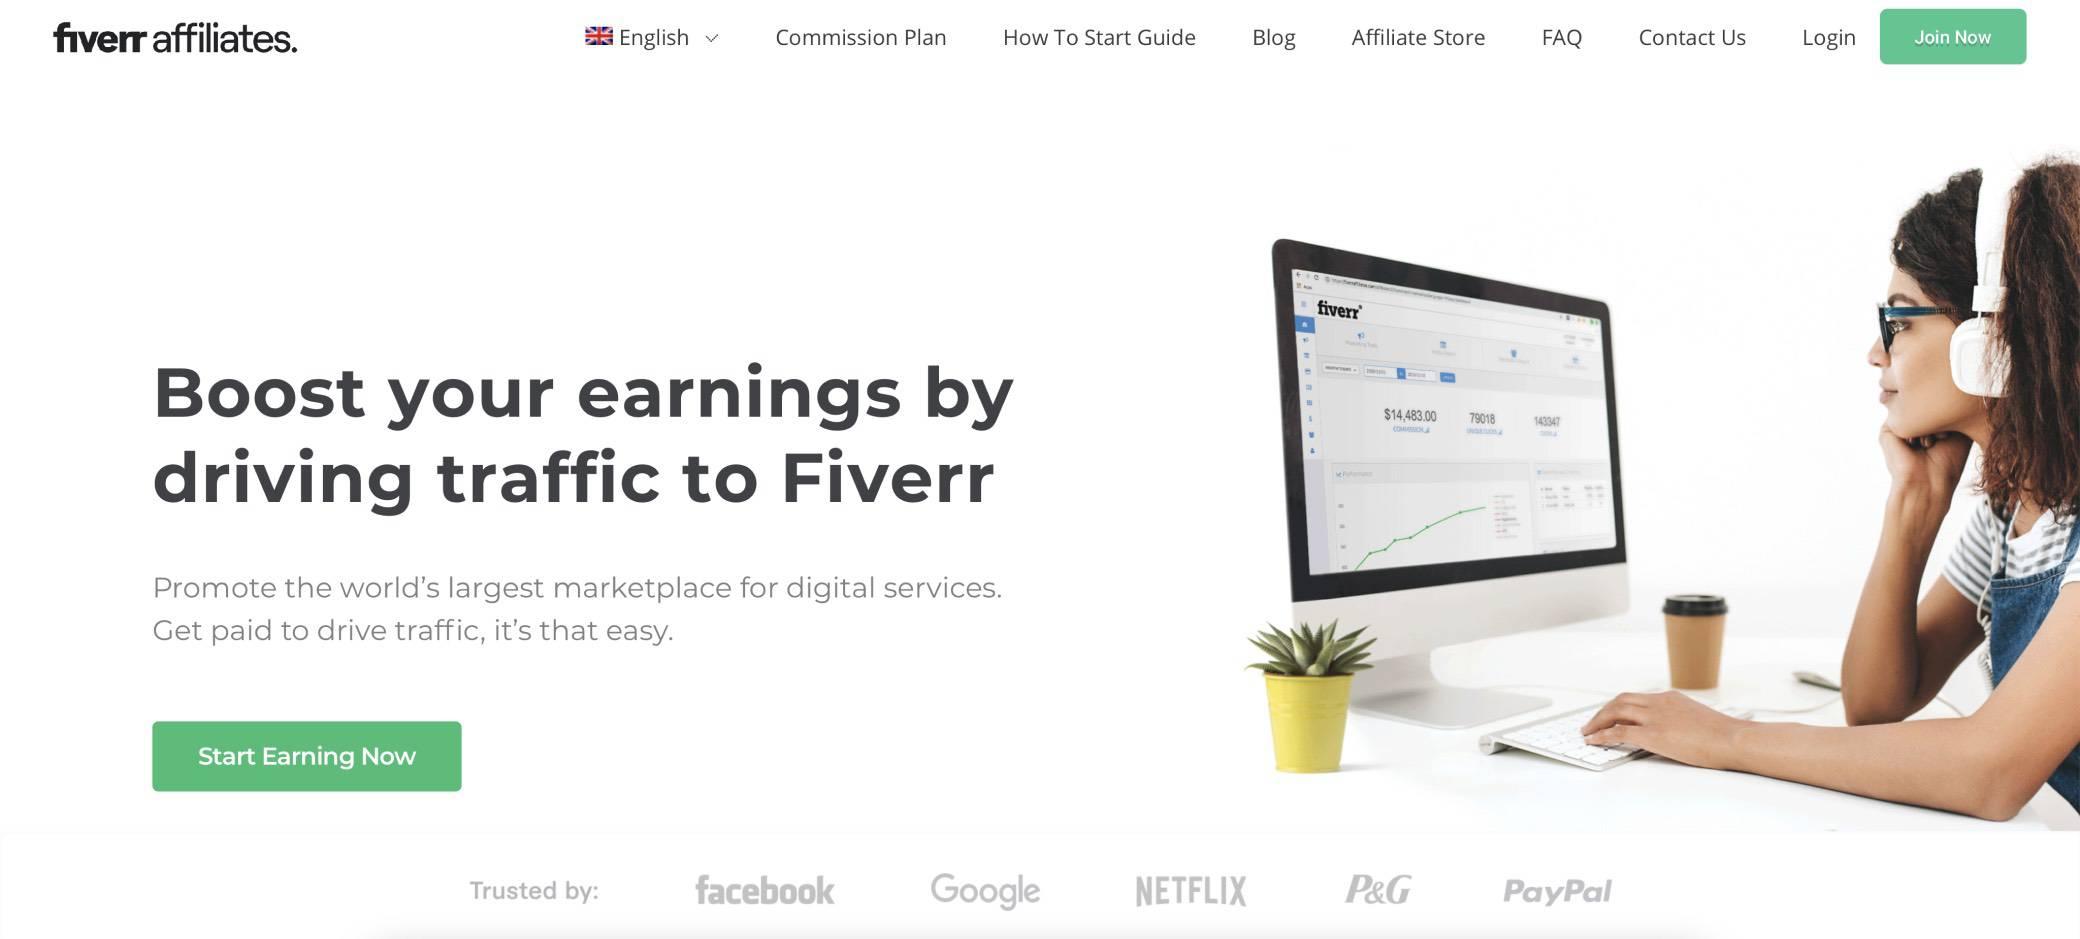 fiverr-affiliates-program image